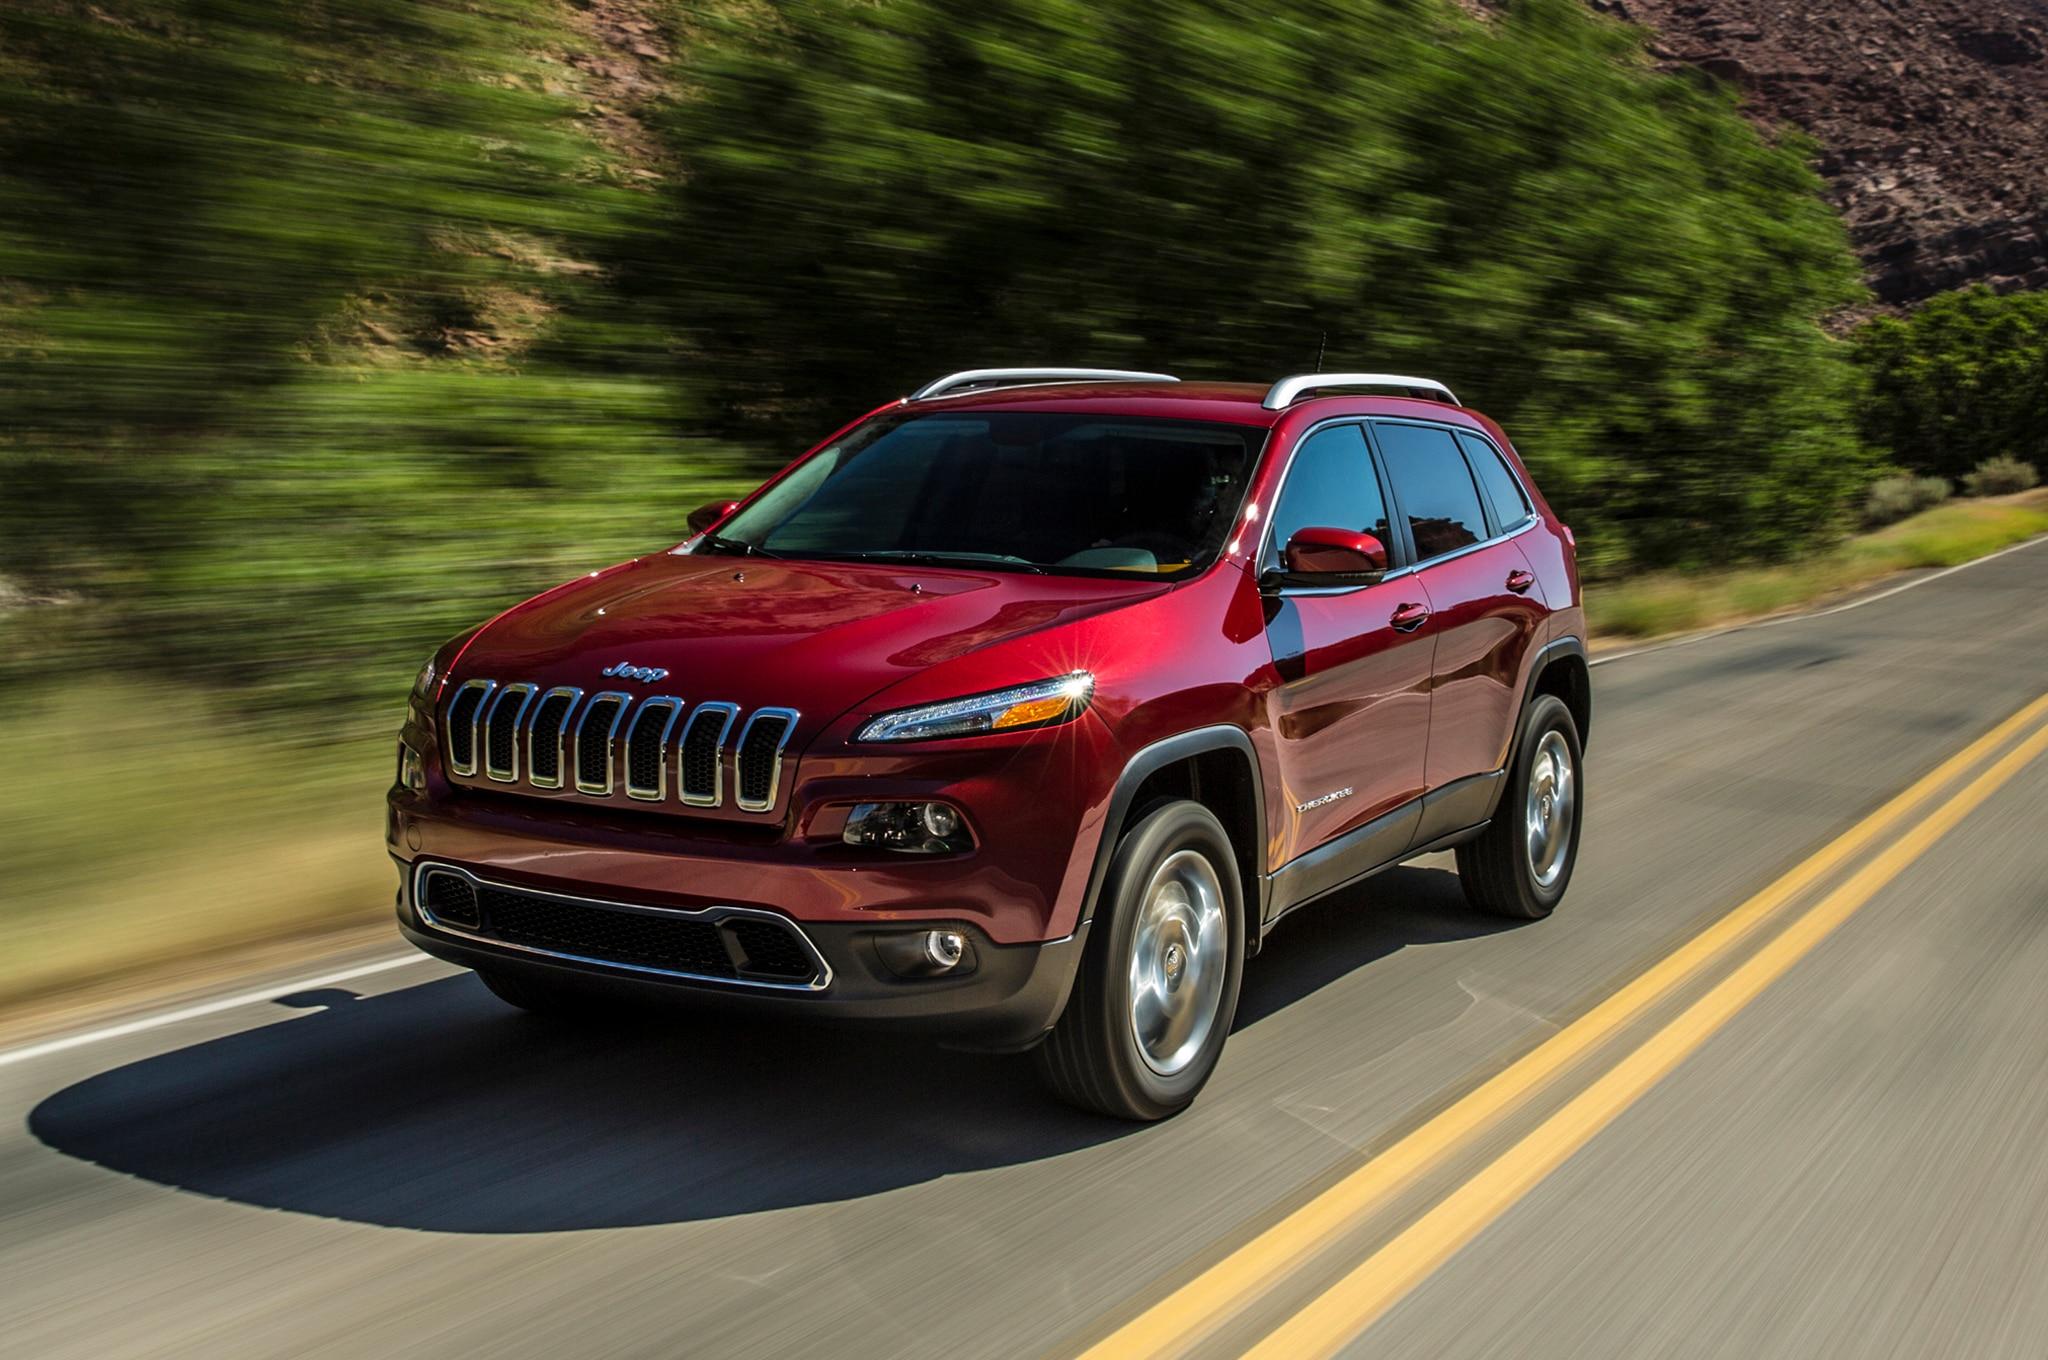 2014 Jeep Cherokee Front Three Quarters1